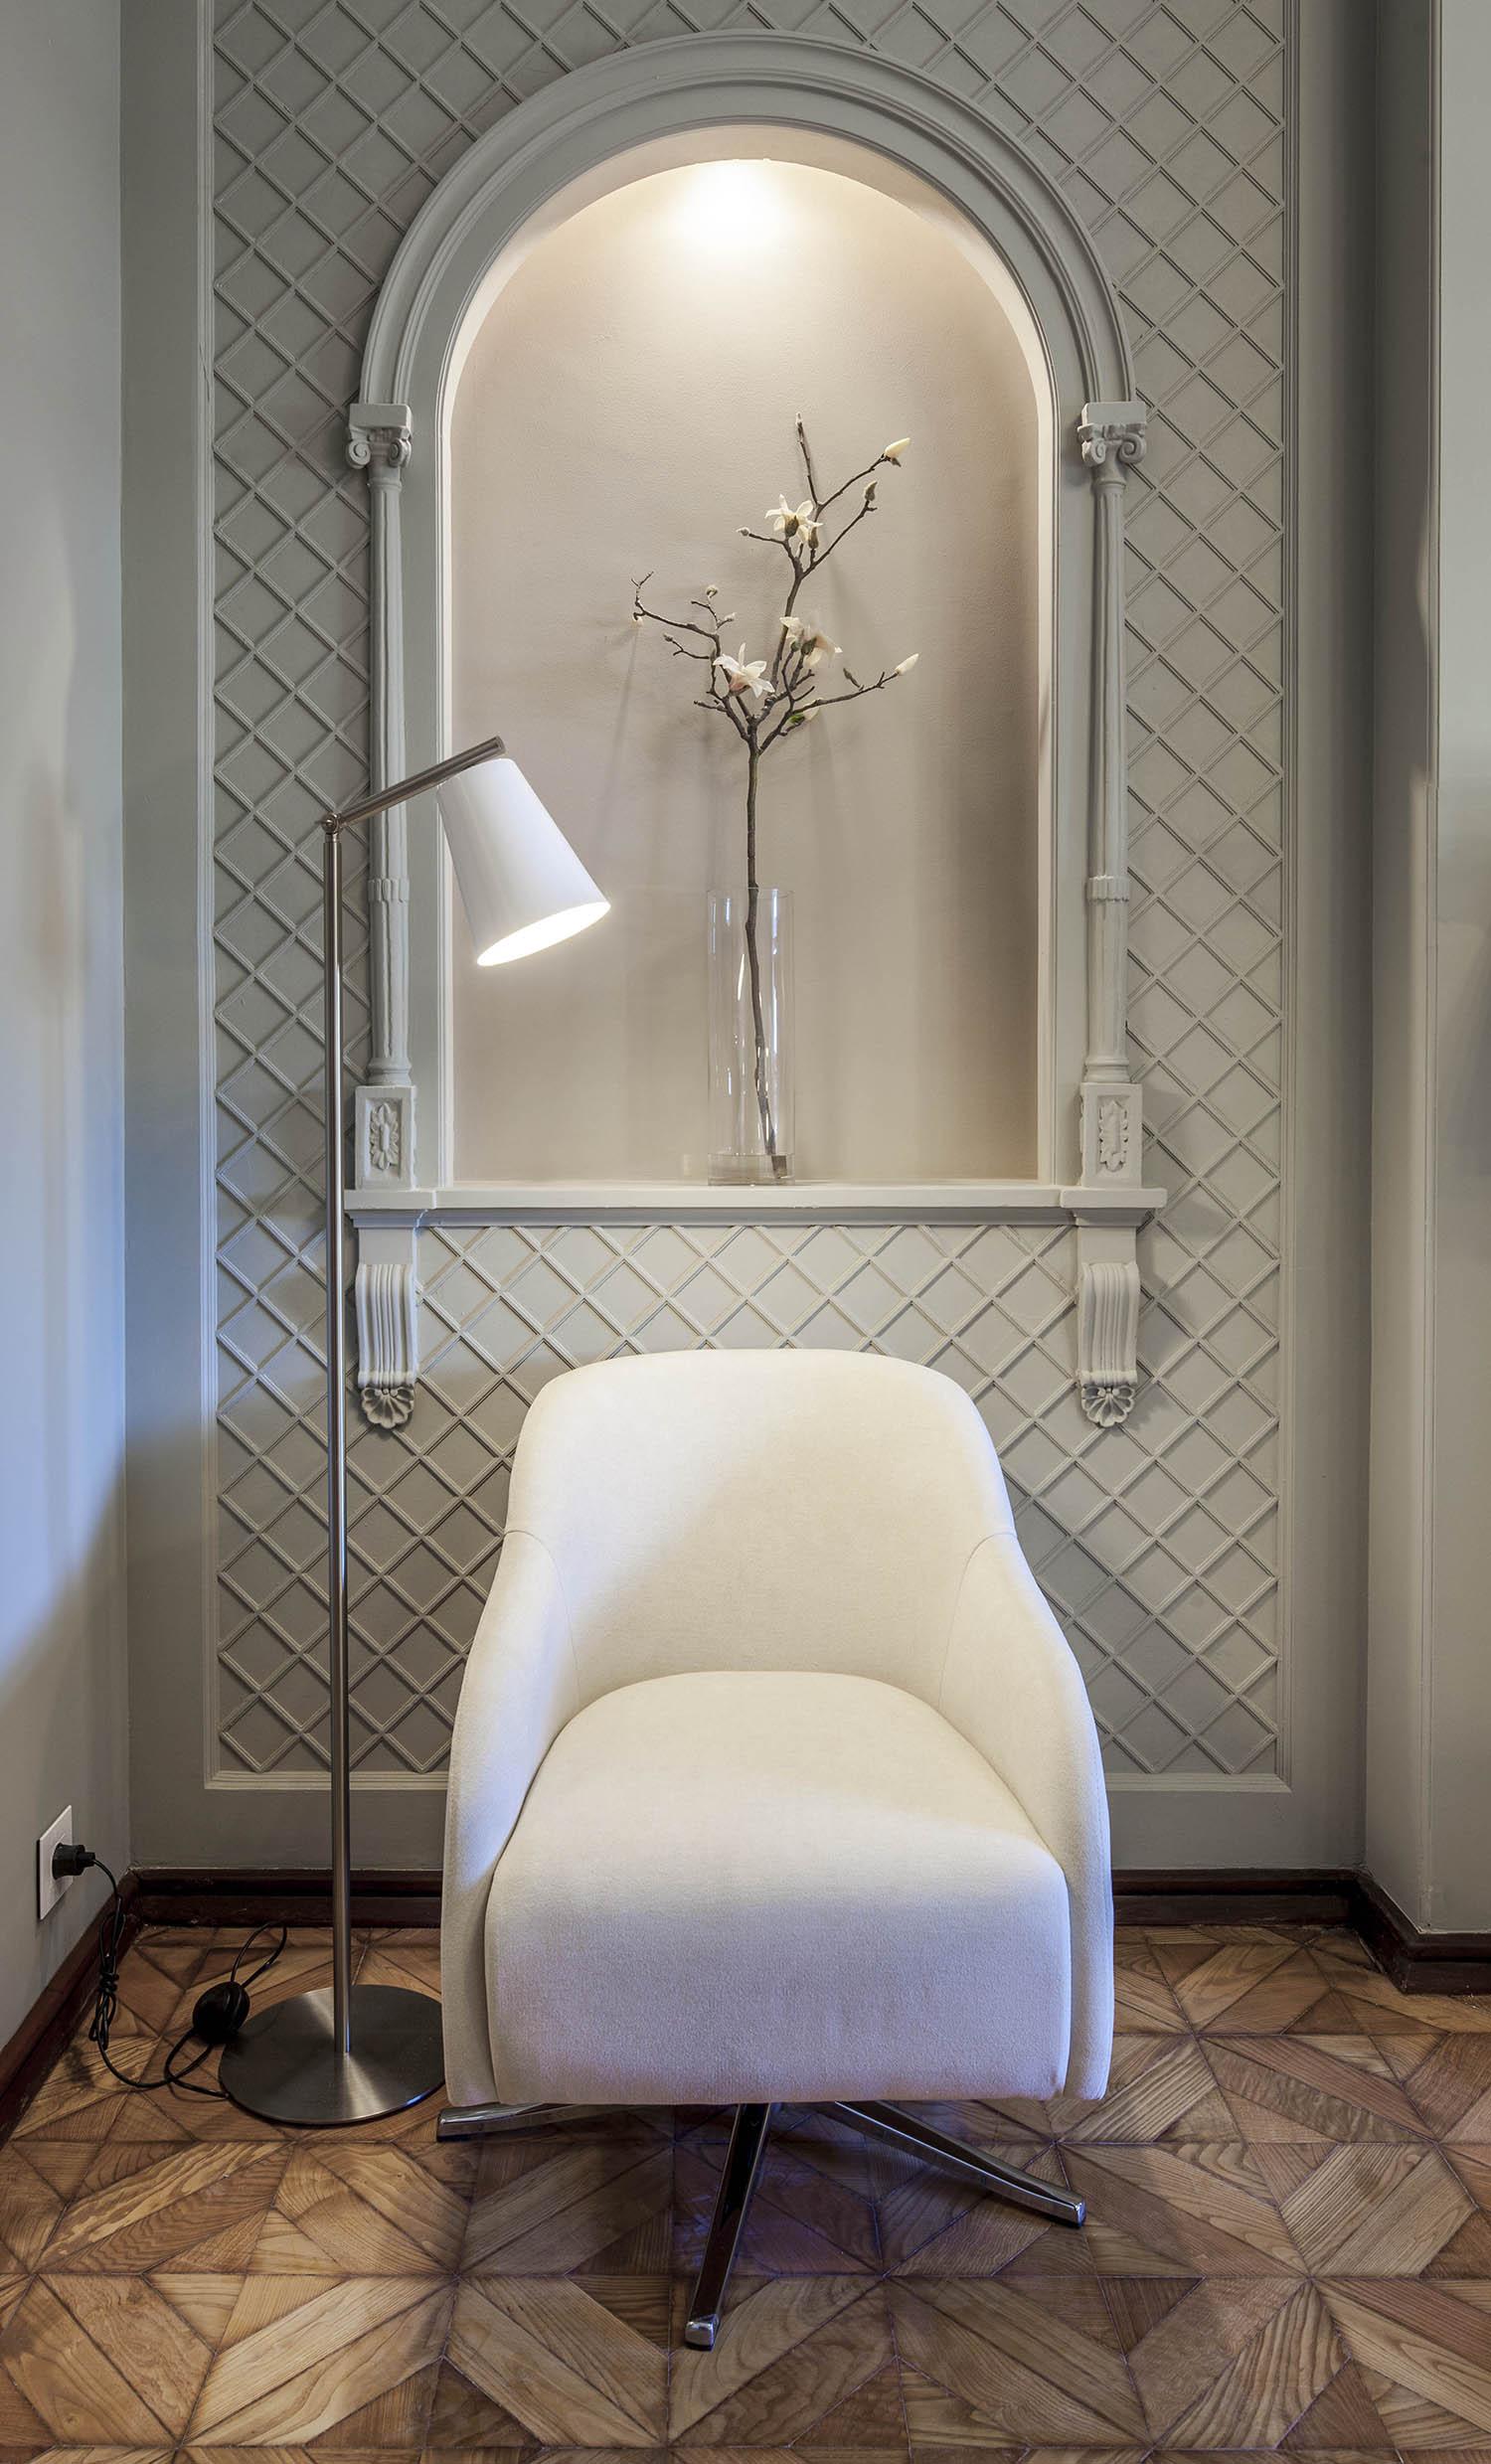 Hotel Luzeiros Suites - Detalhes